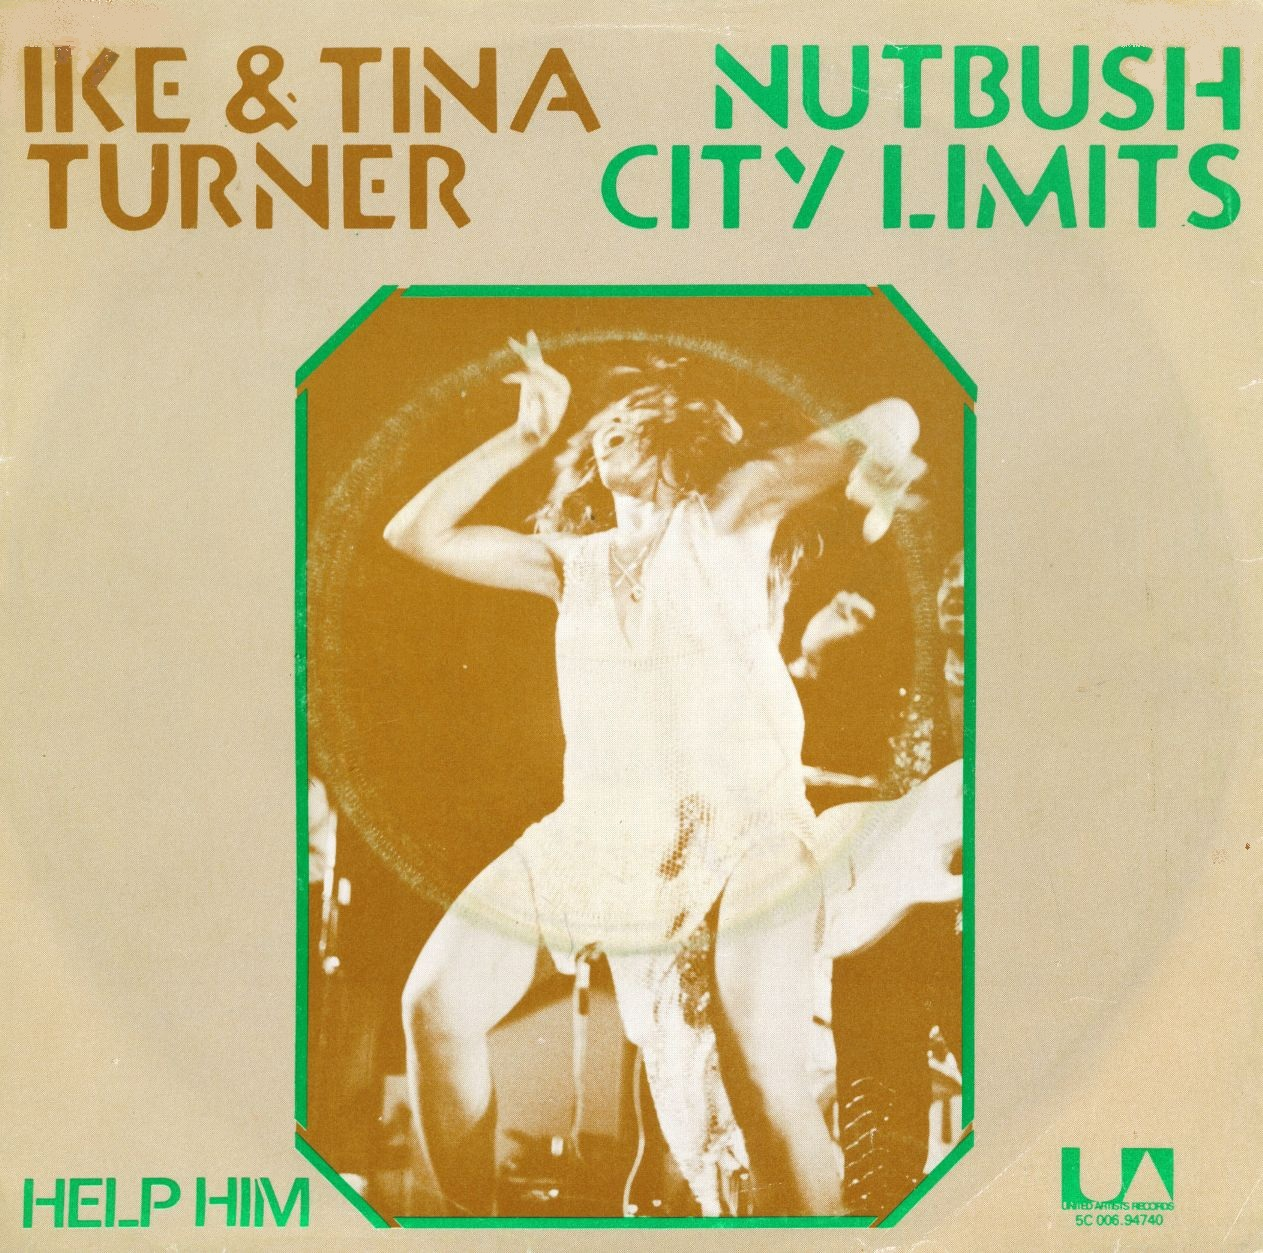 http://4.bp.blogspot.com/-FyZgKwM9akY/TsFx35RltaI/AAAAAAAAAj0/LYmmcNfaxp0/s1600/ike+%2526+tina+turner+-+nutbush+city+limits.jpeg